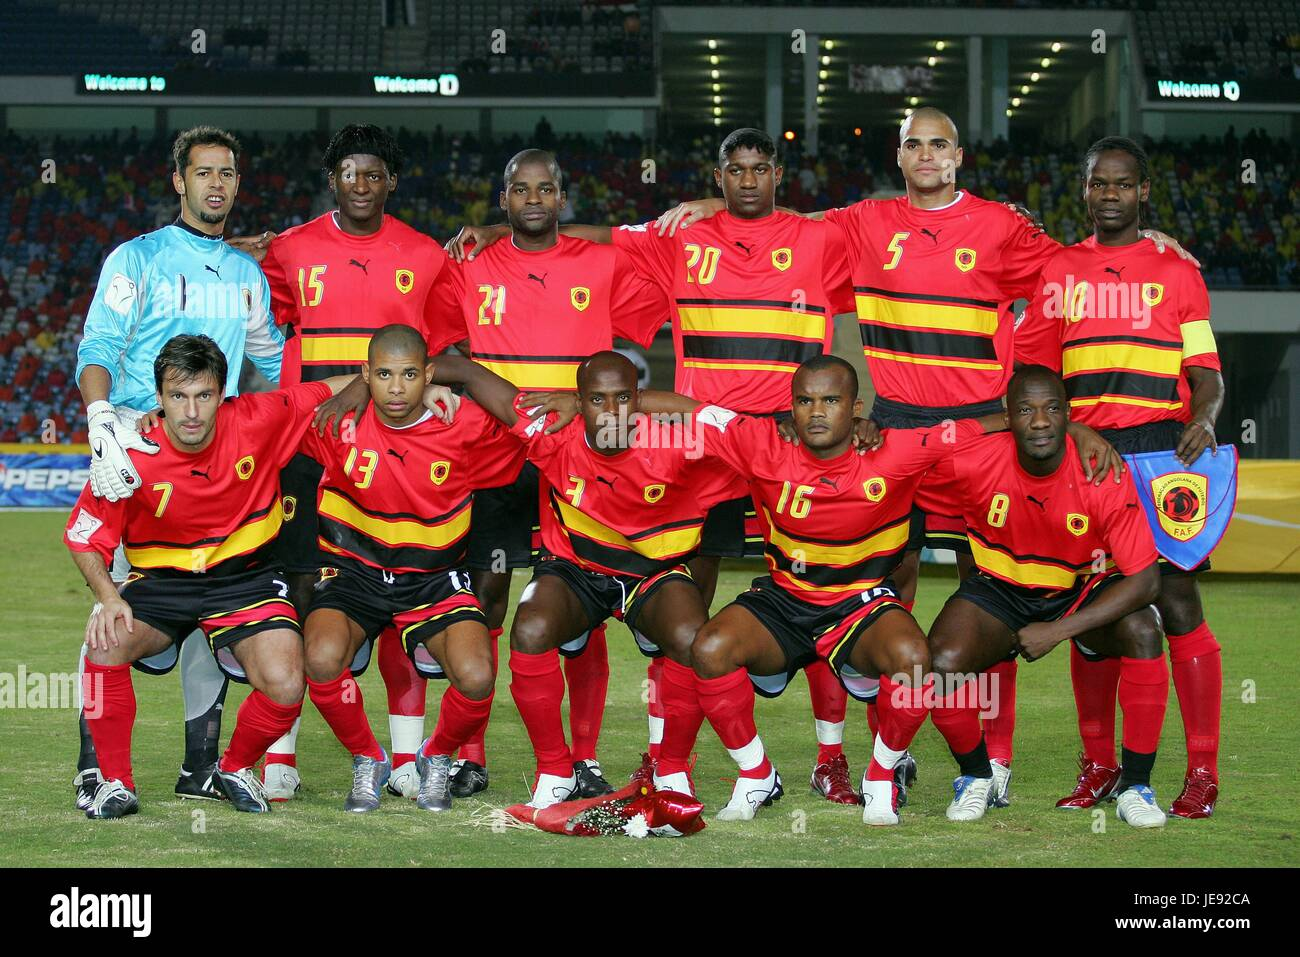 finest selection 4876a ee91f ANGOLA TEAM ANGOLA NATIONAL TEAM CAIRO EGYPT 29 January 2006 ...